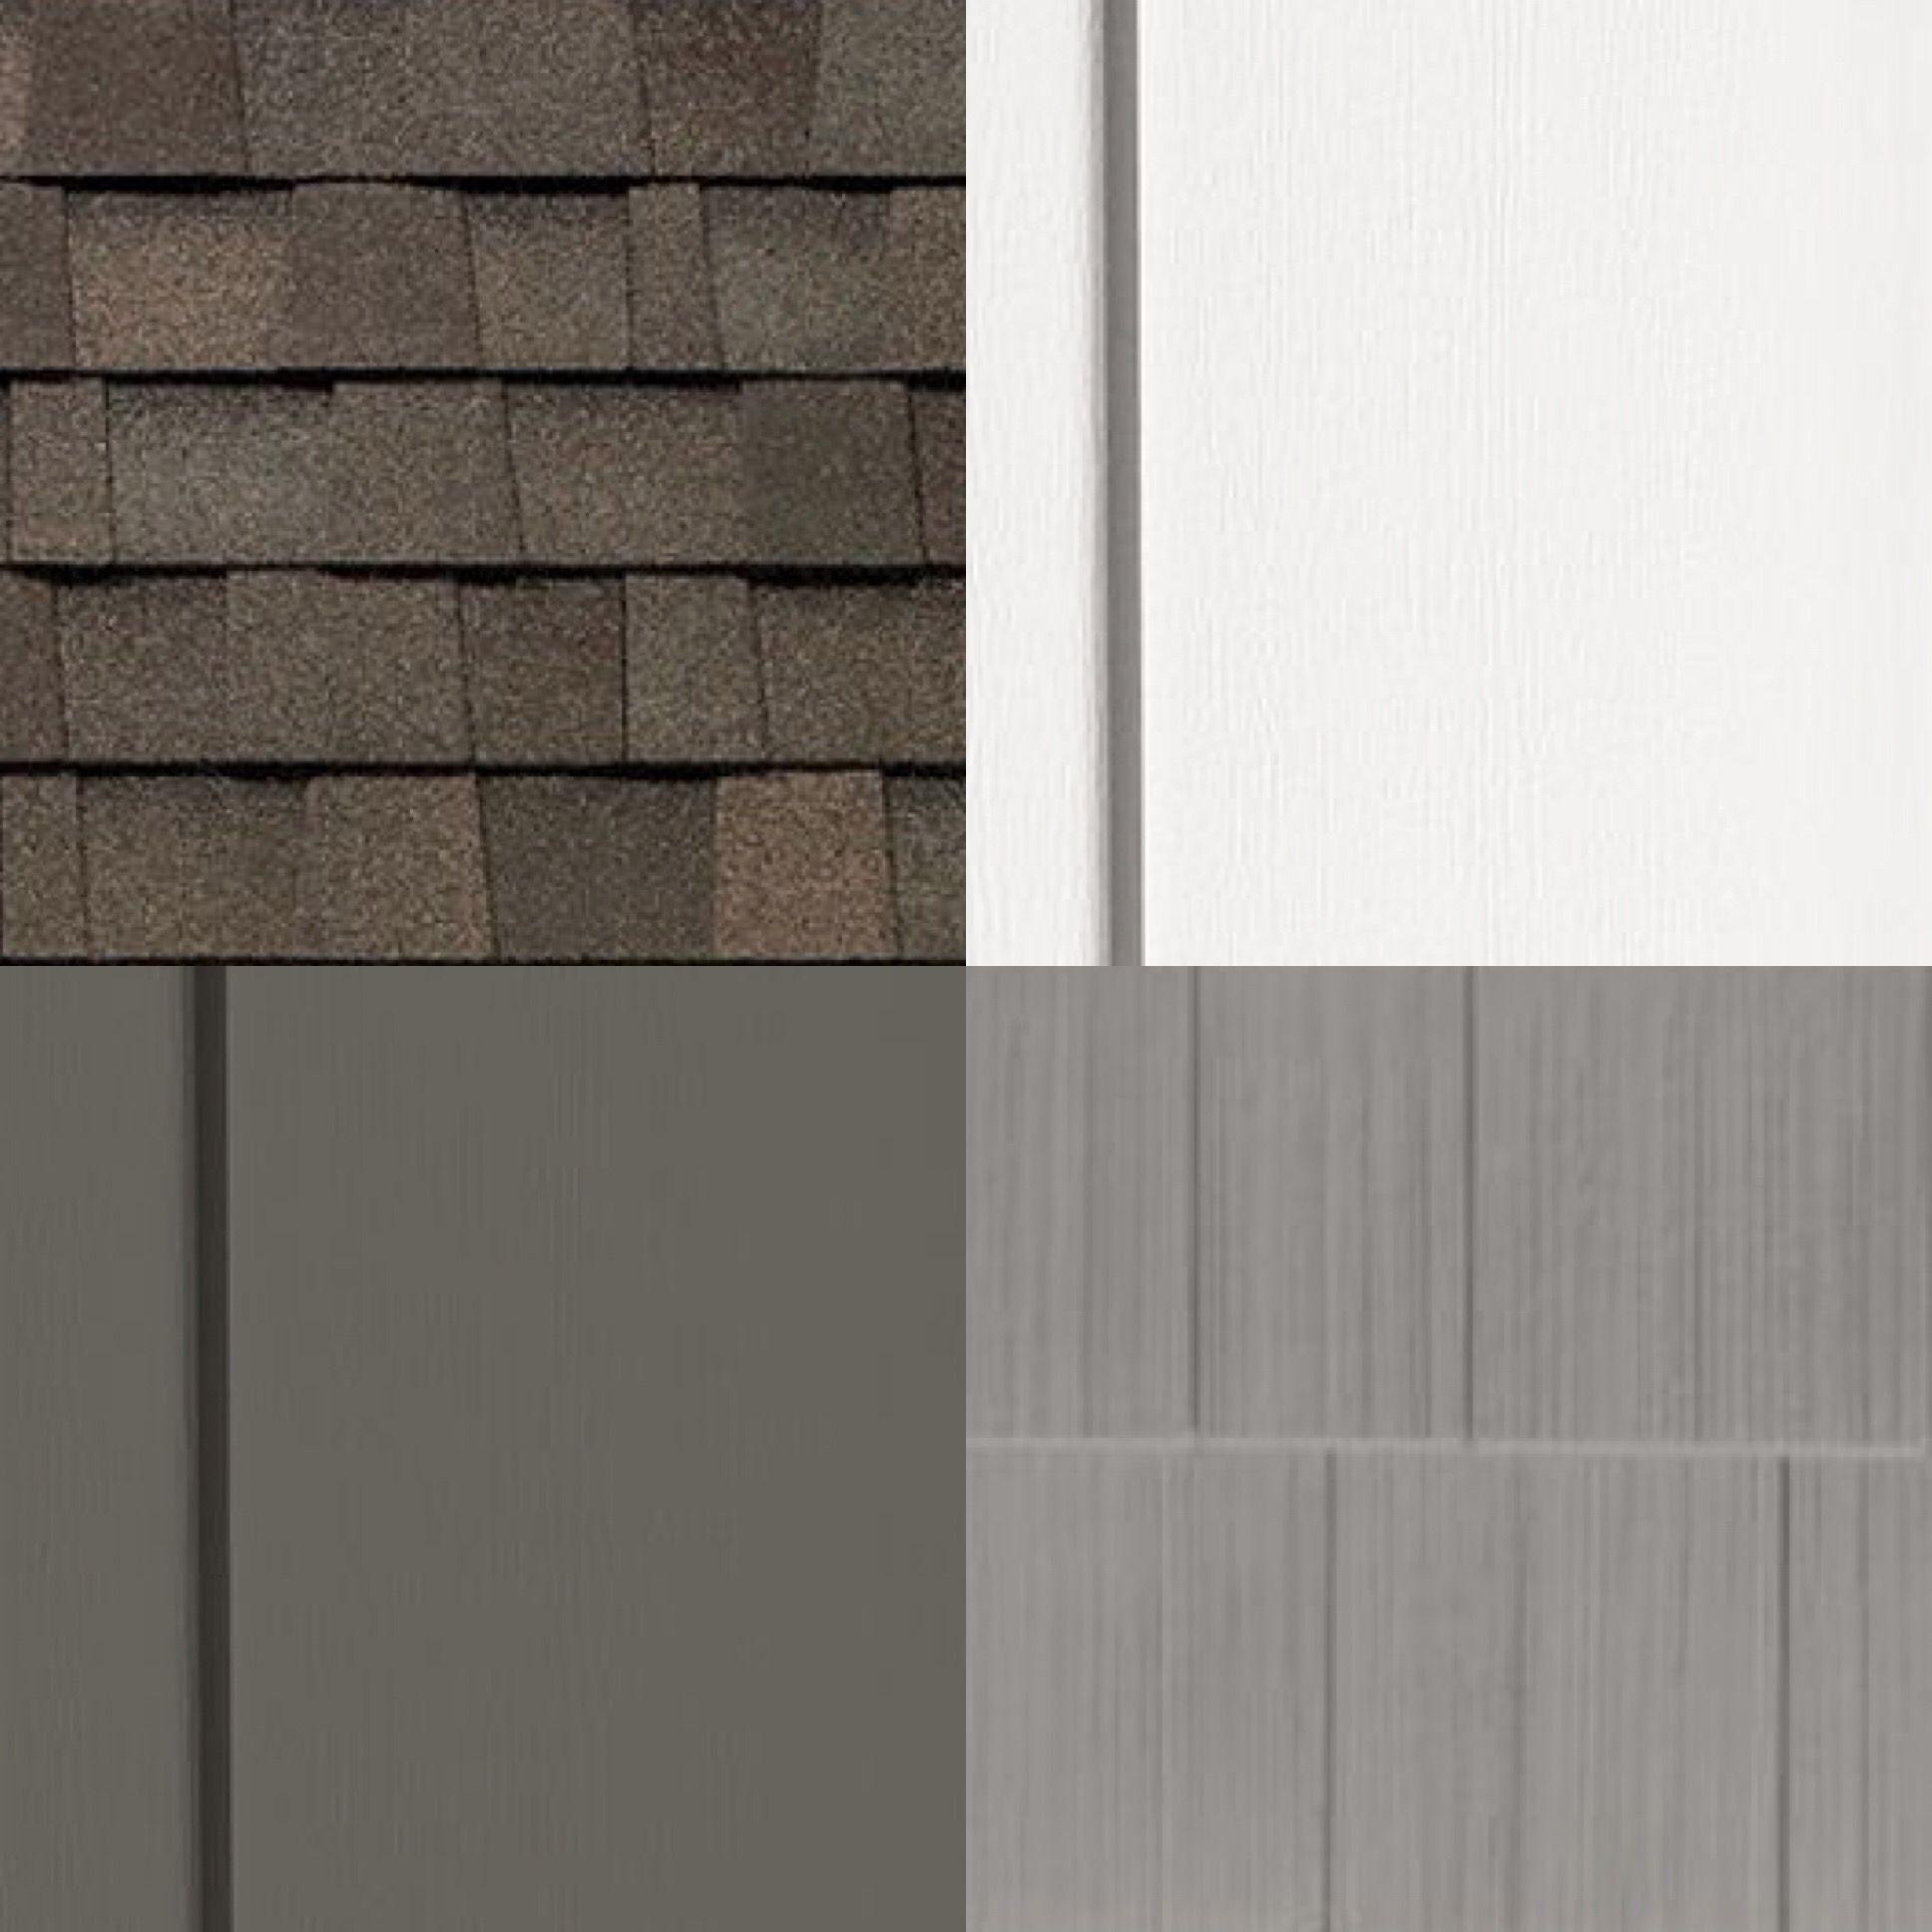 Tamko Natural Timber - White Board and Batten - Castlemore Board